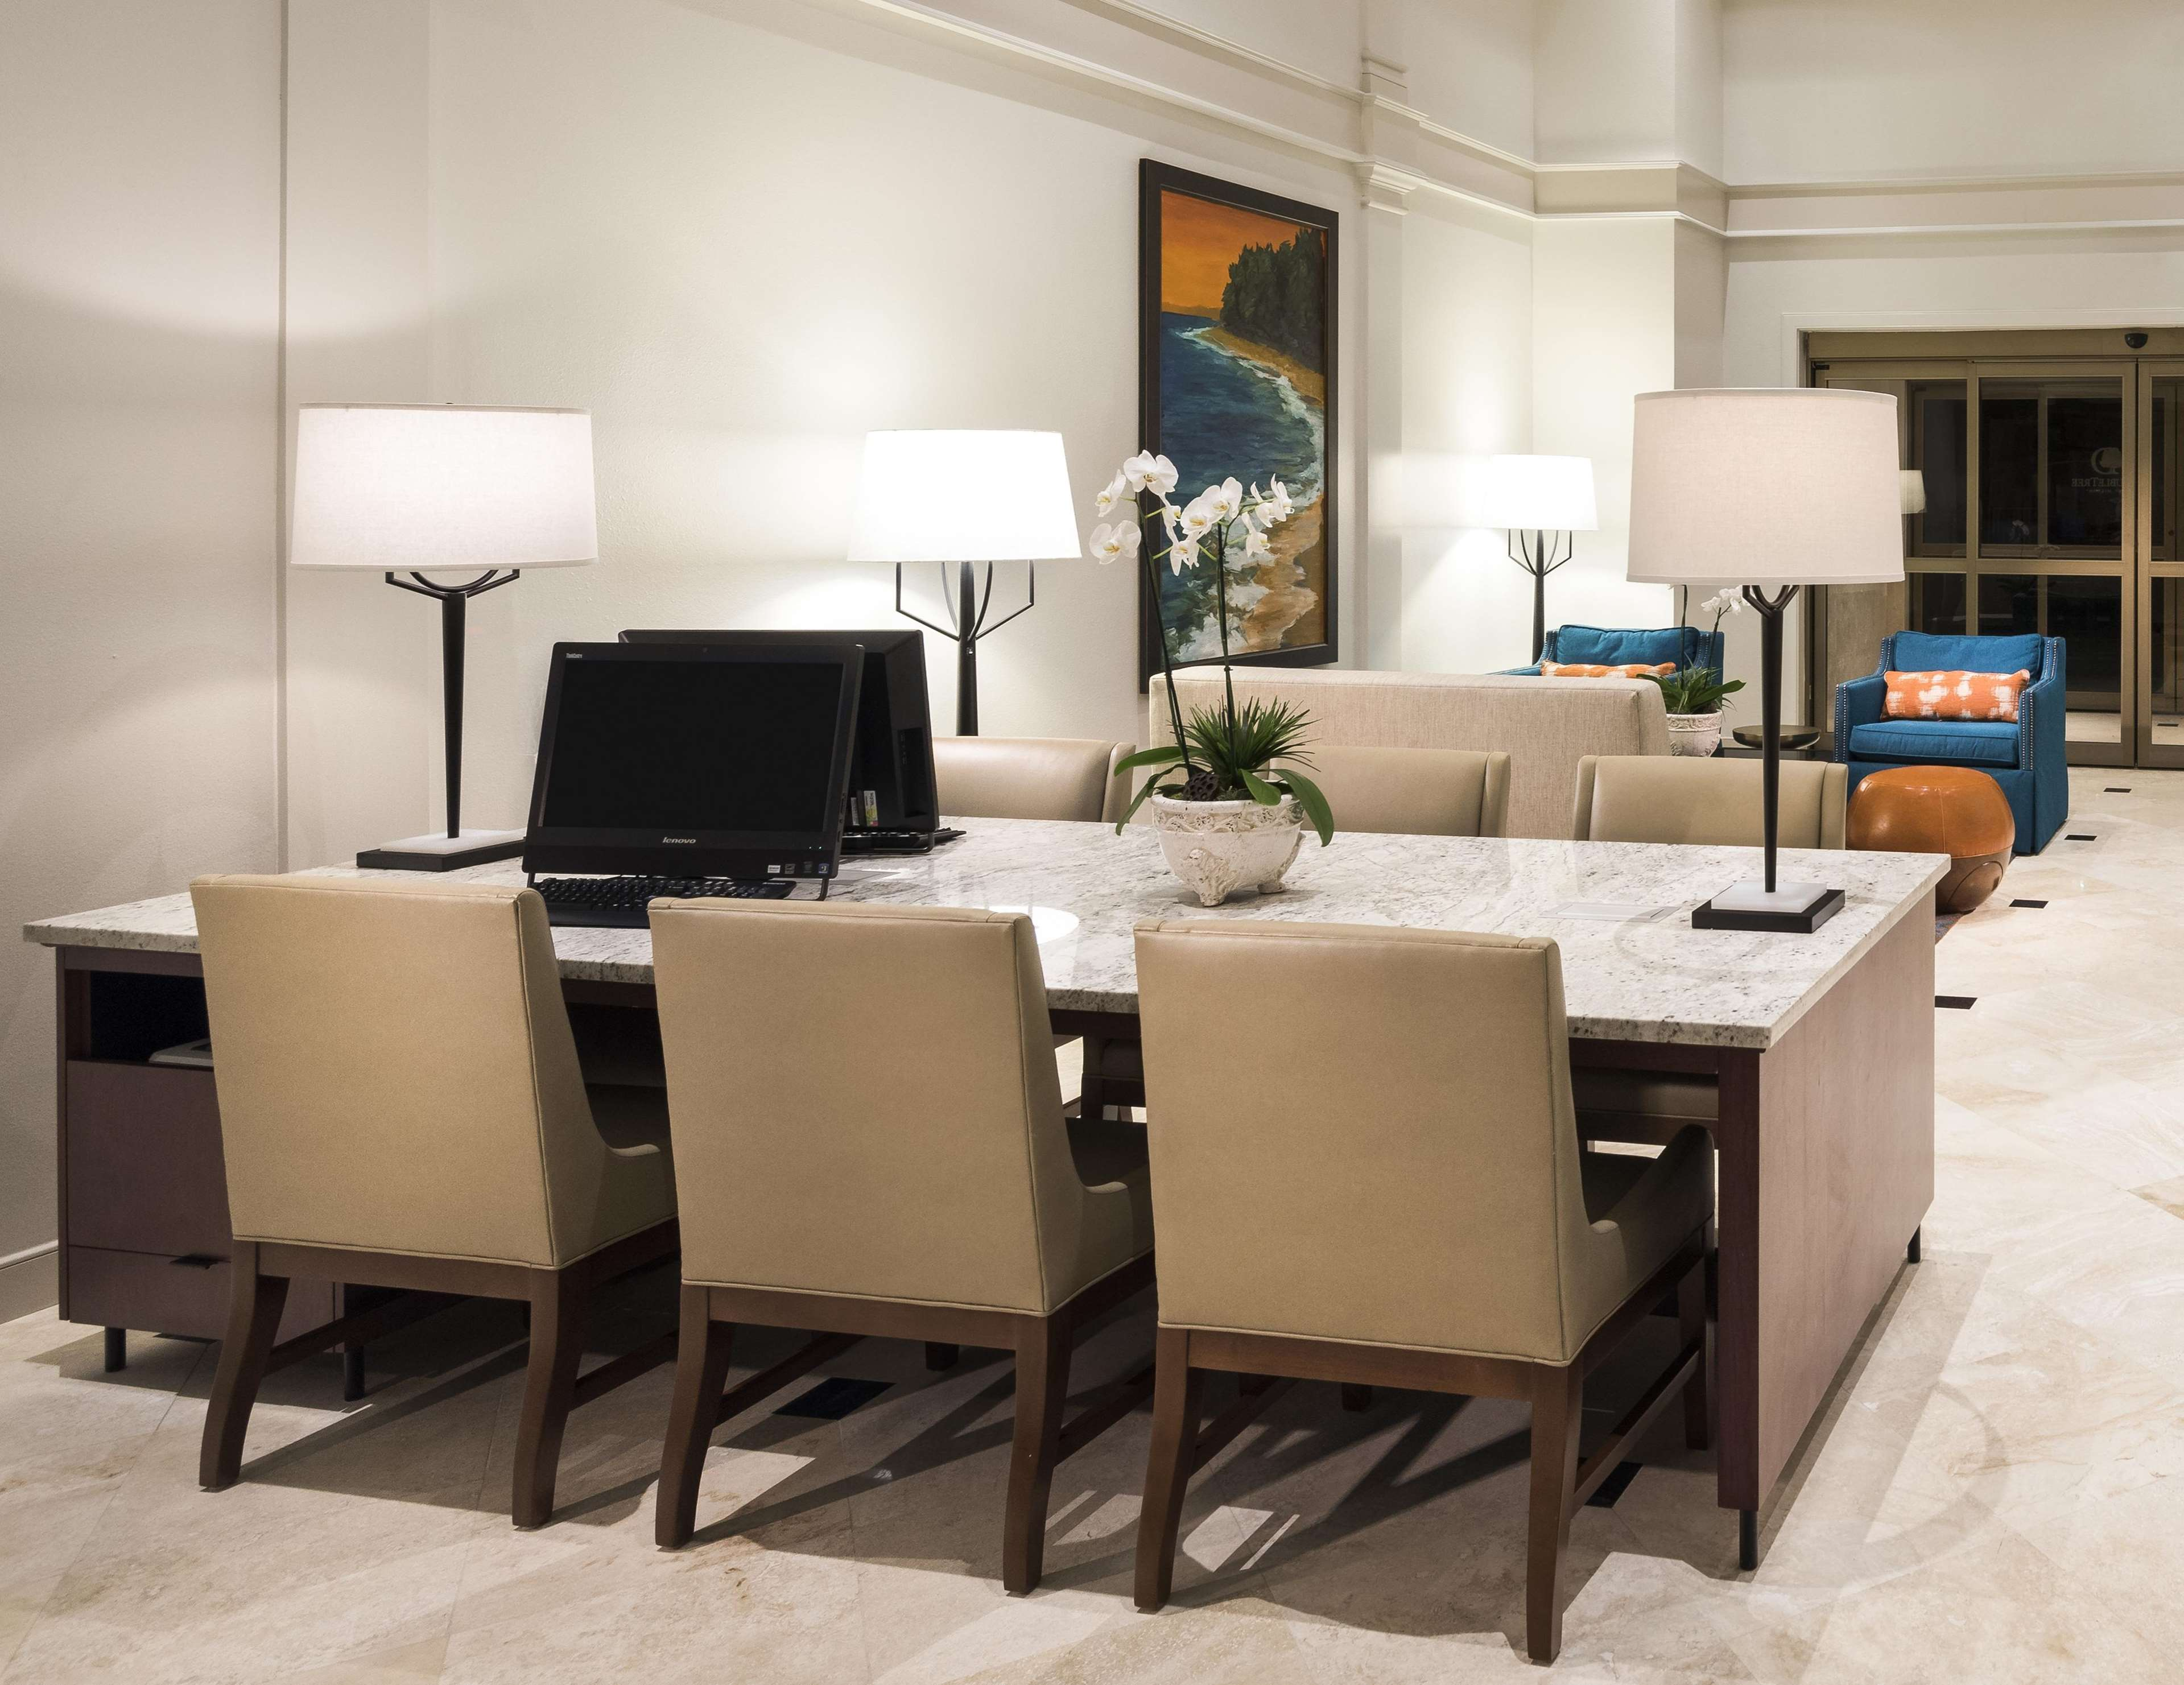 DoubleTree Suites by Hilton Hotel Naples image 8